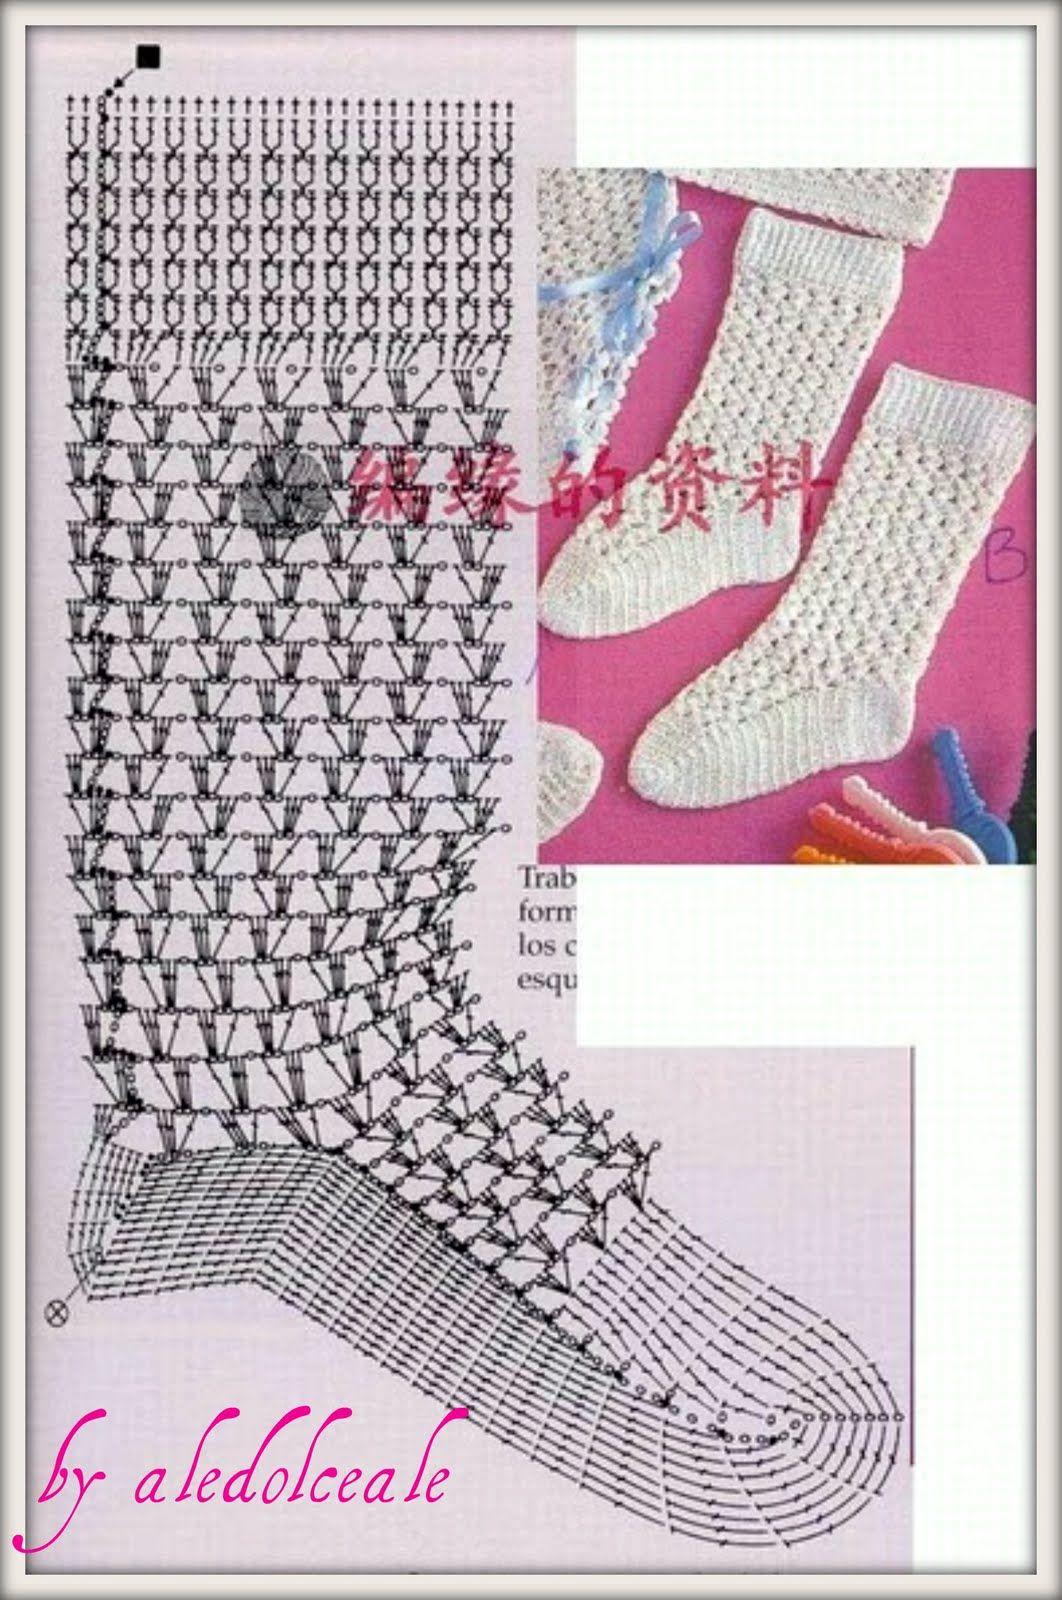 diagram crochet pattern cat6 wall jack wiring socks things to do knit